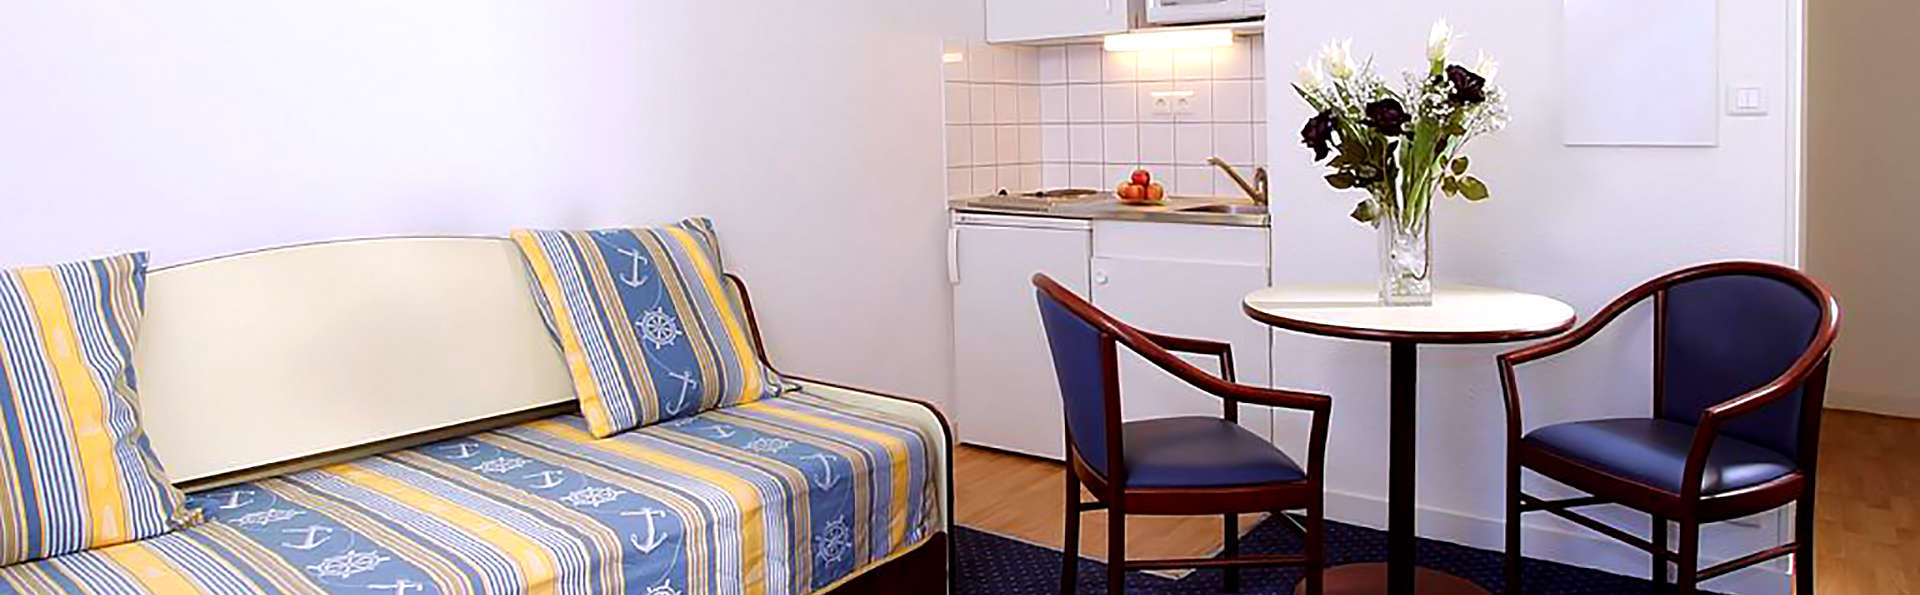 Résidence Terres de France Brest - Edit_Apartment3.jpg